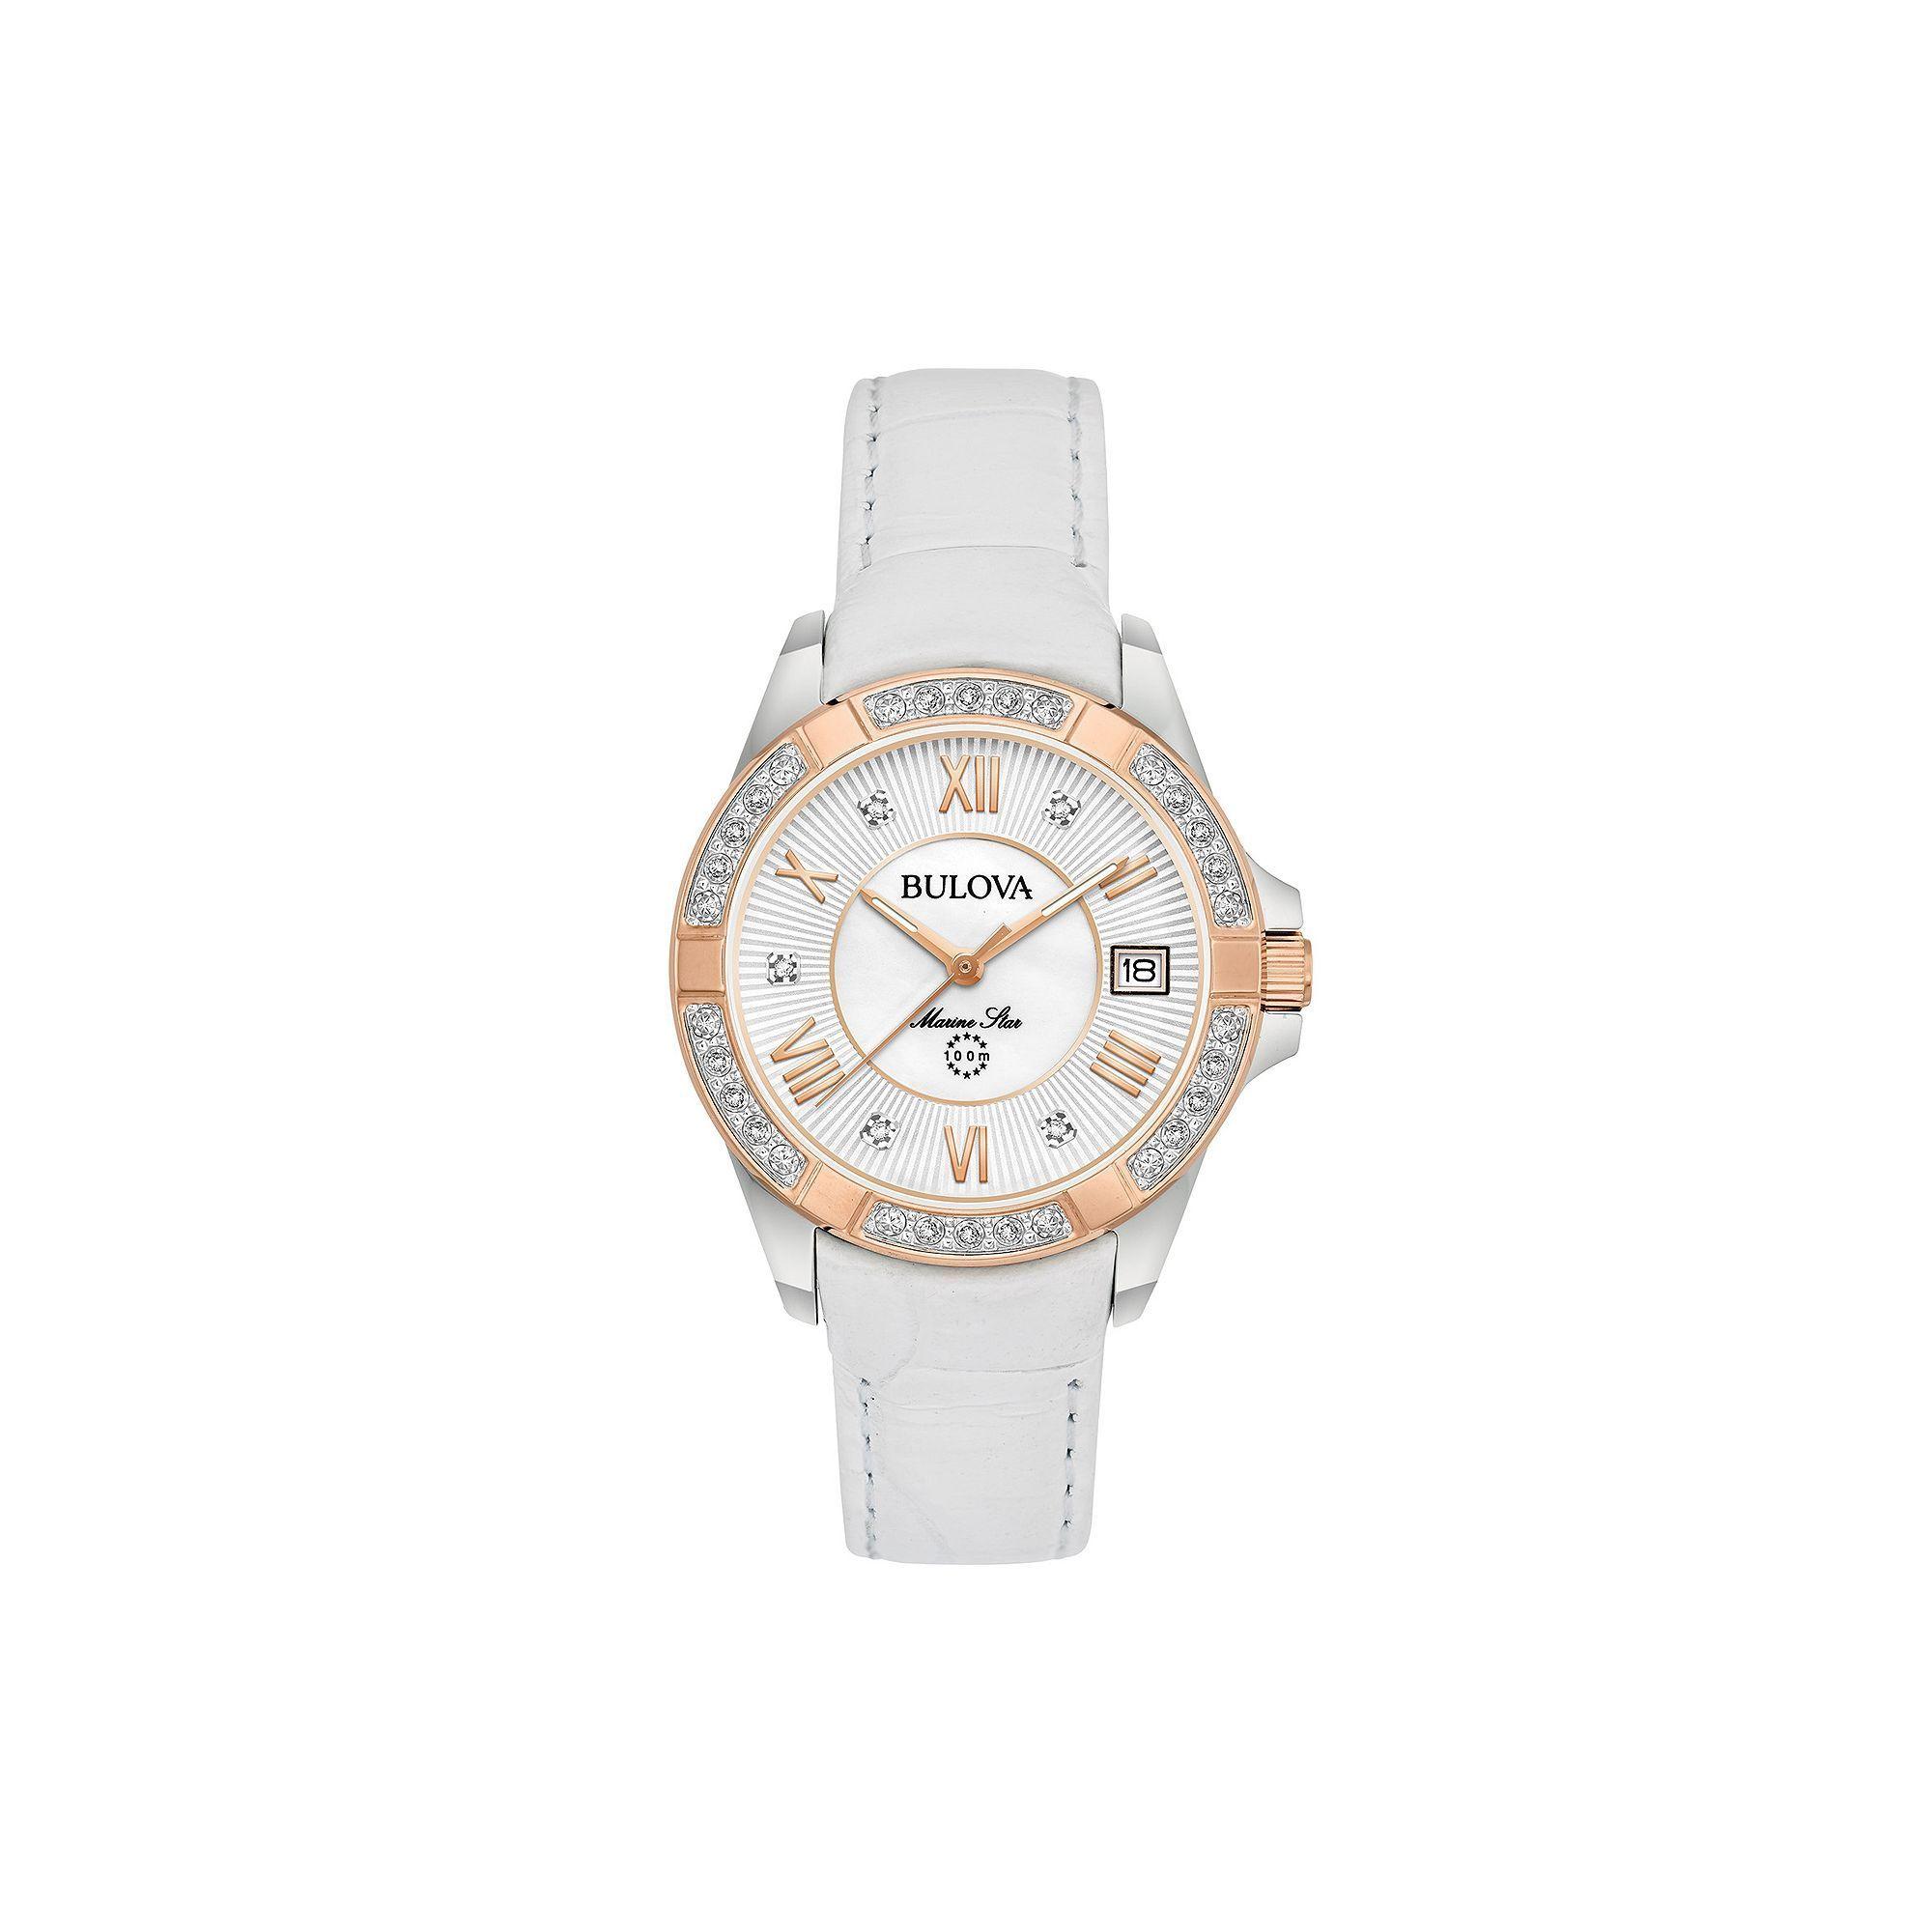 42f4a1366 Bulova Women's Marine Star Diamond Leather Watch - 98R233 | Products ...